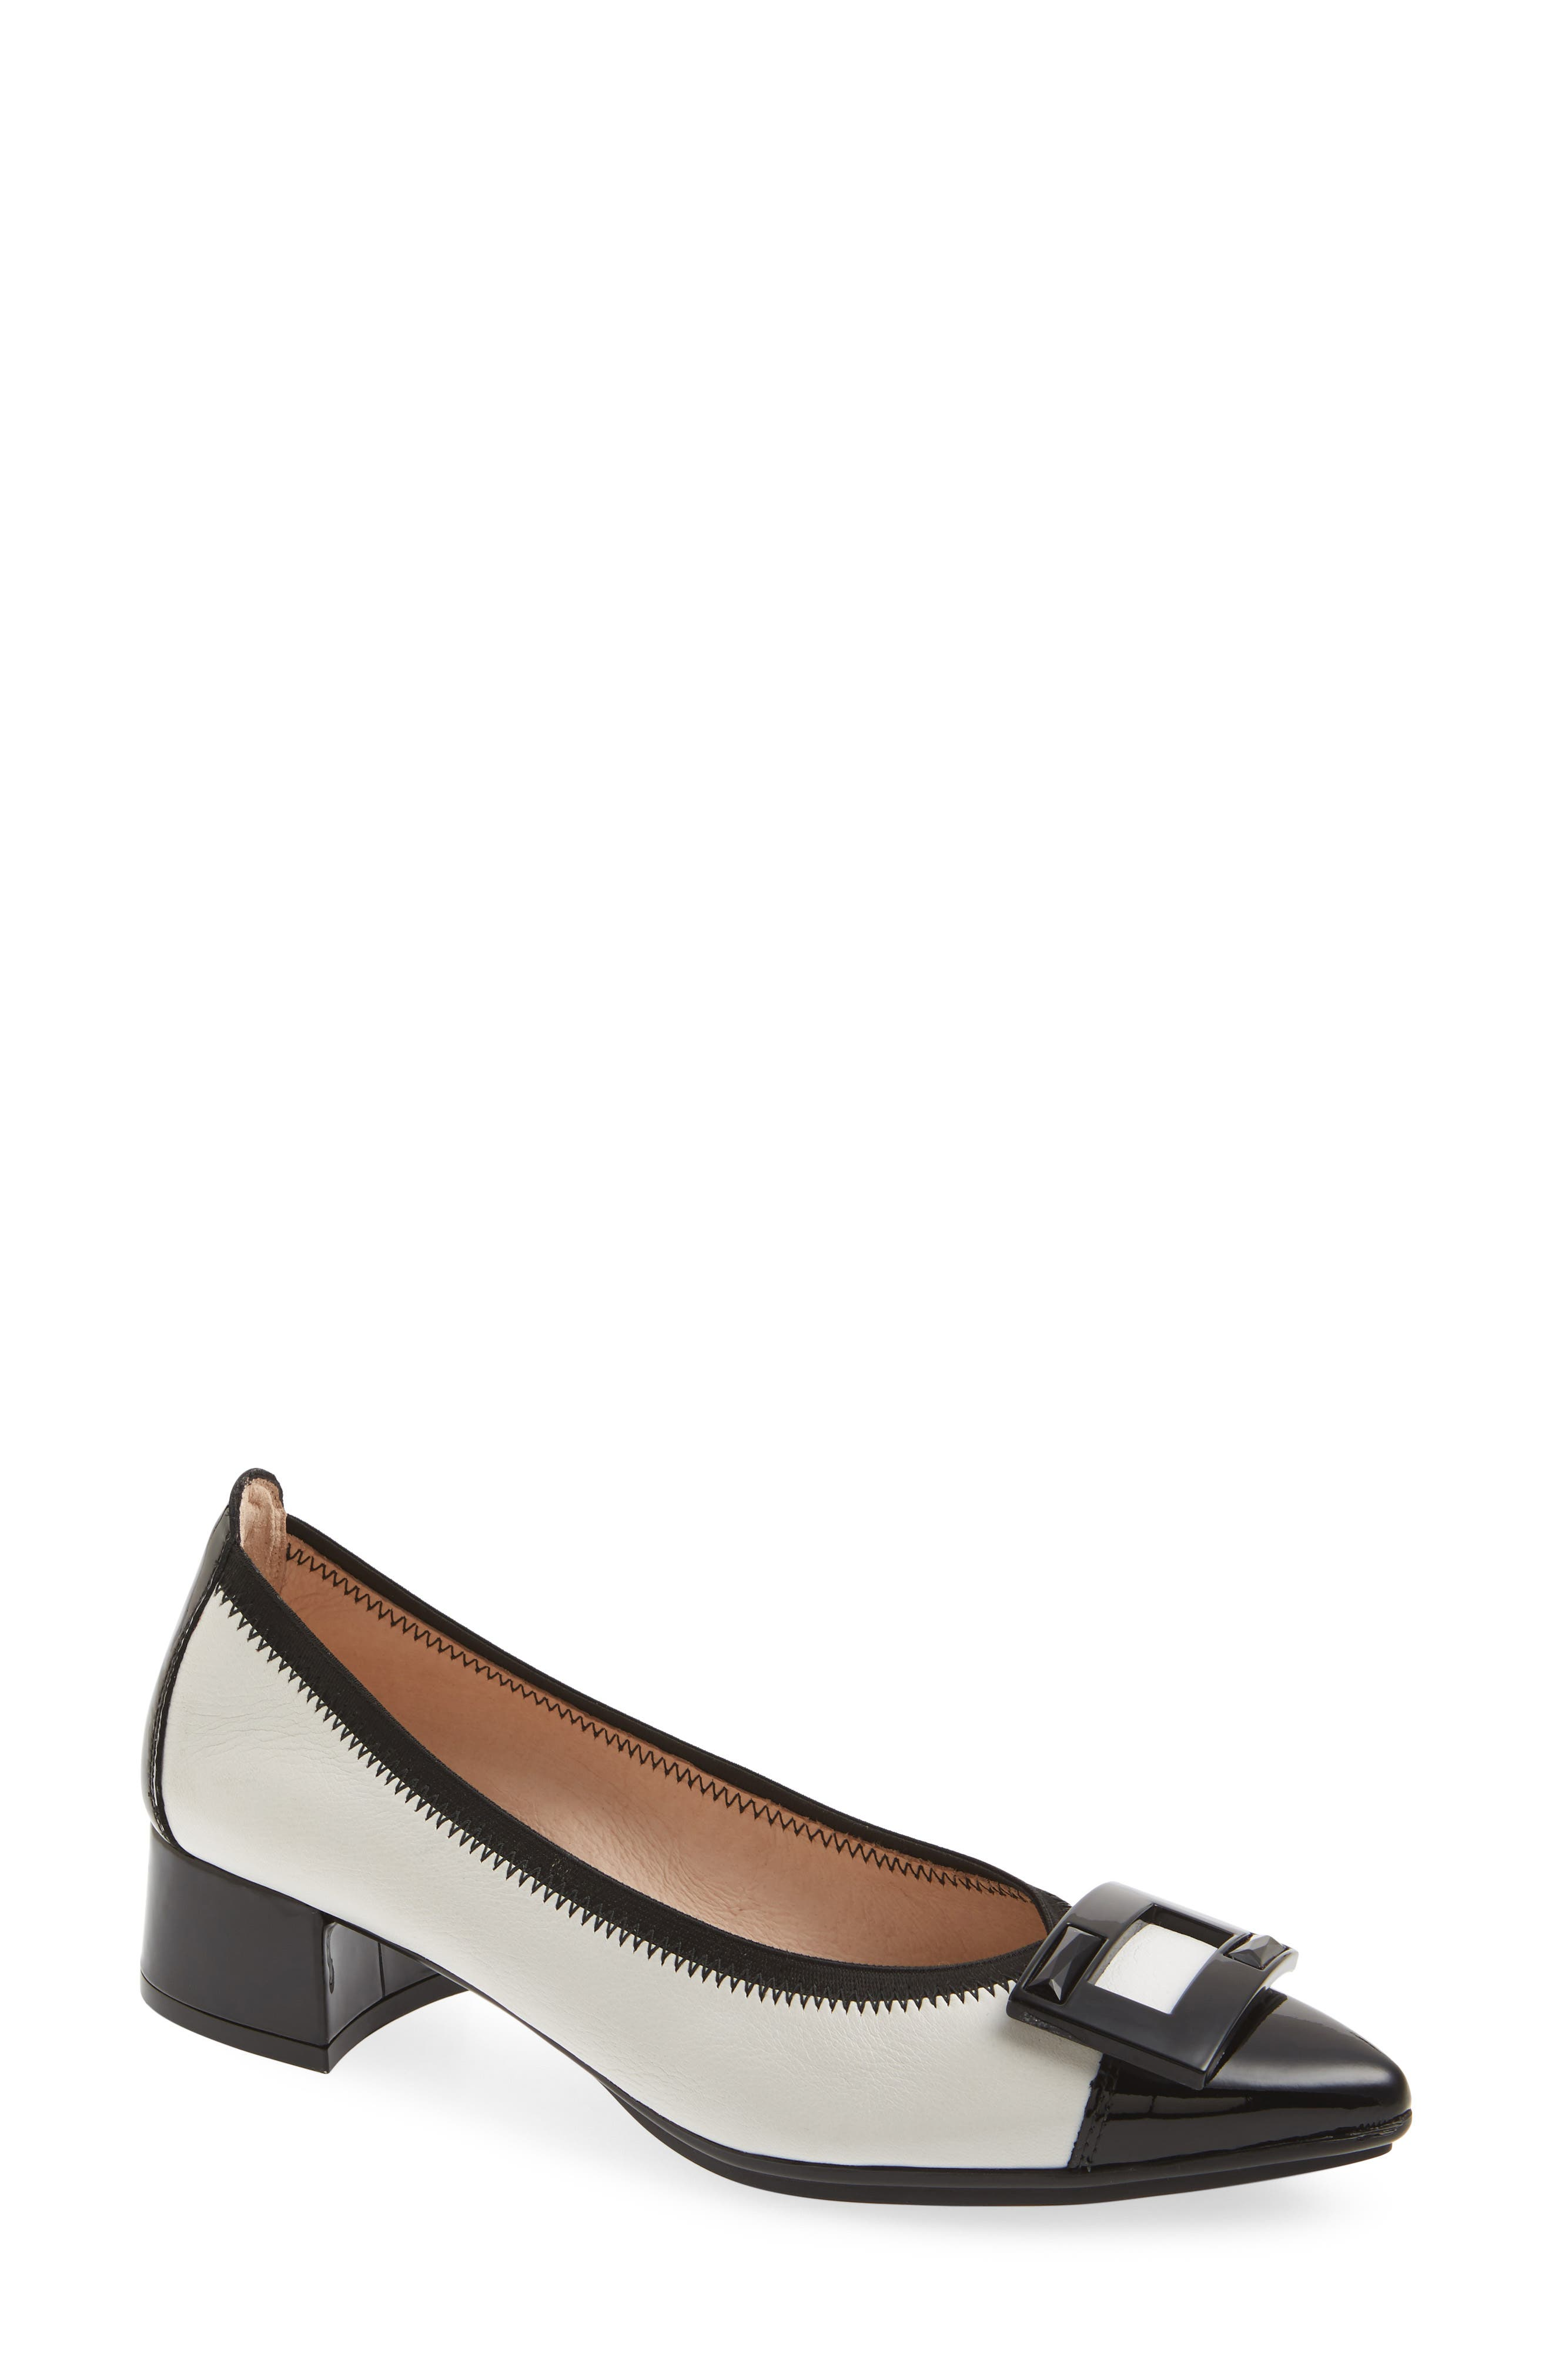 865f8b3f5d89 Hispanitas Women s Shoes